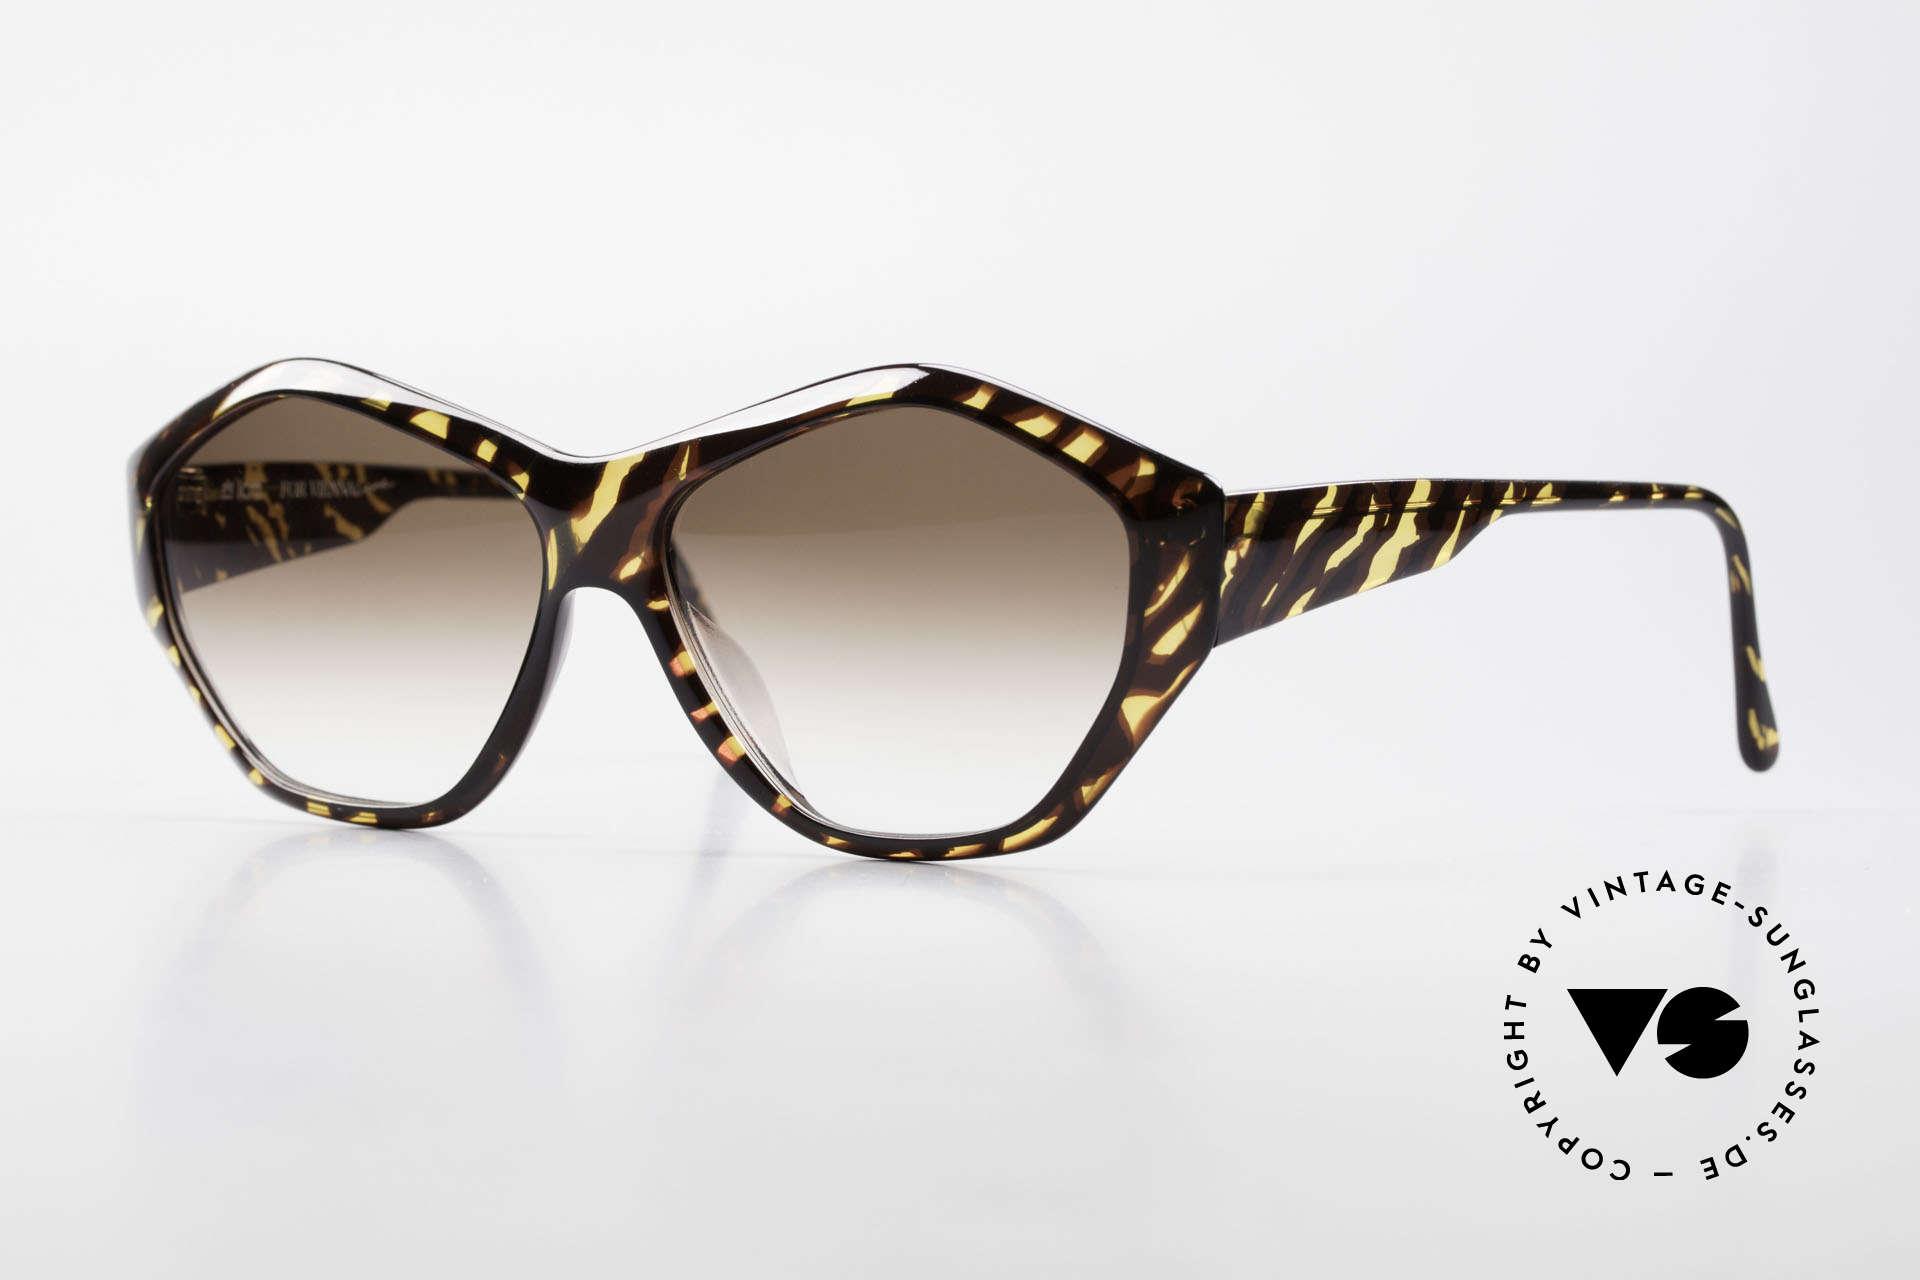 Paloma Picasso 1463 90's Optyl Sunglasses Ladies, vintage ladies sunglasses by P. PICASSO from 1990, Made for Women